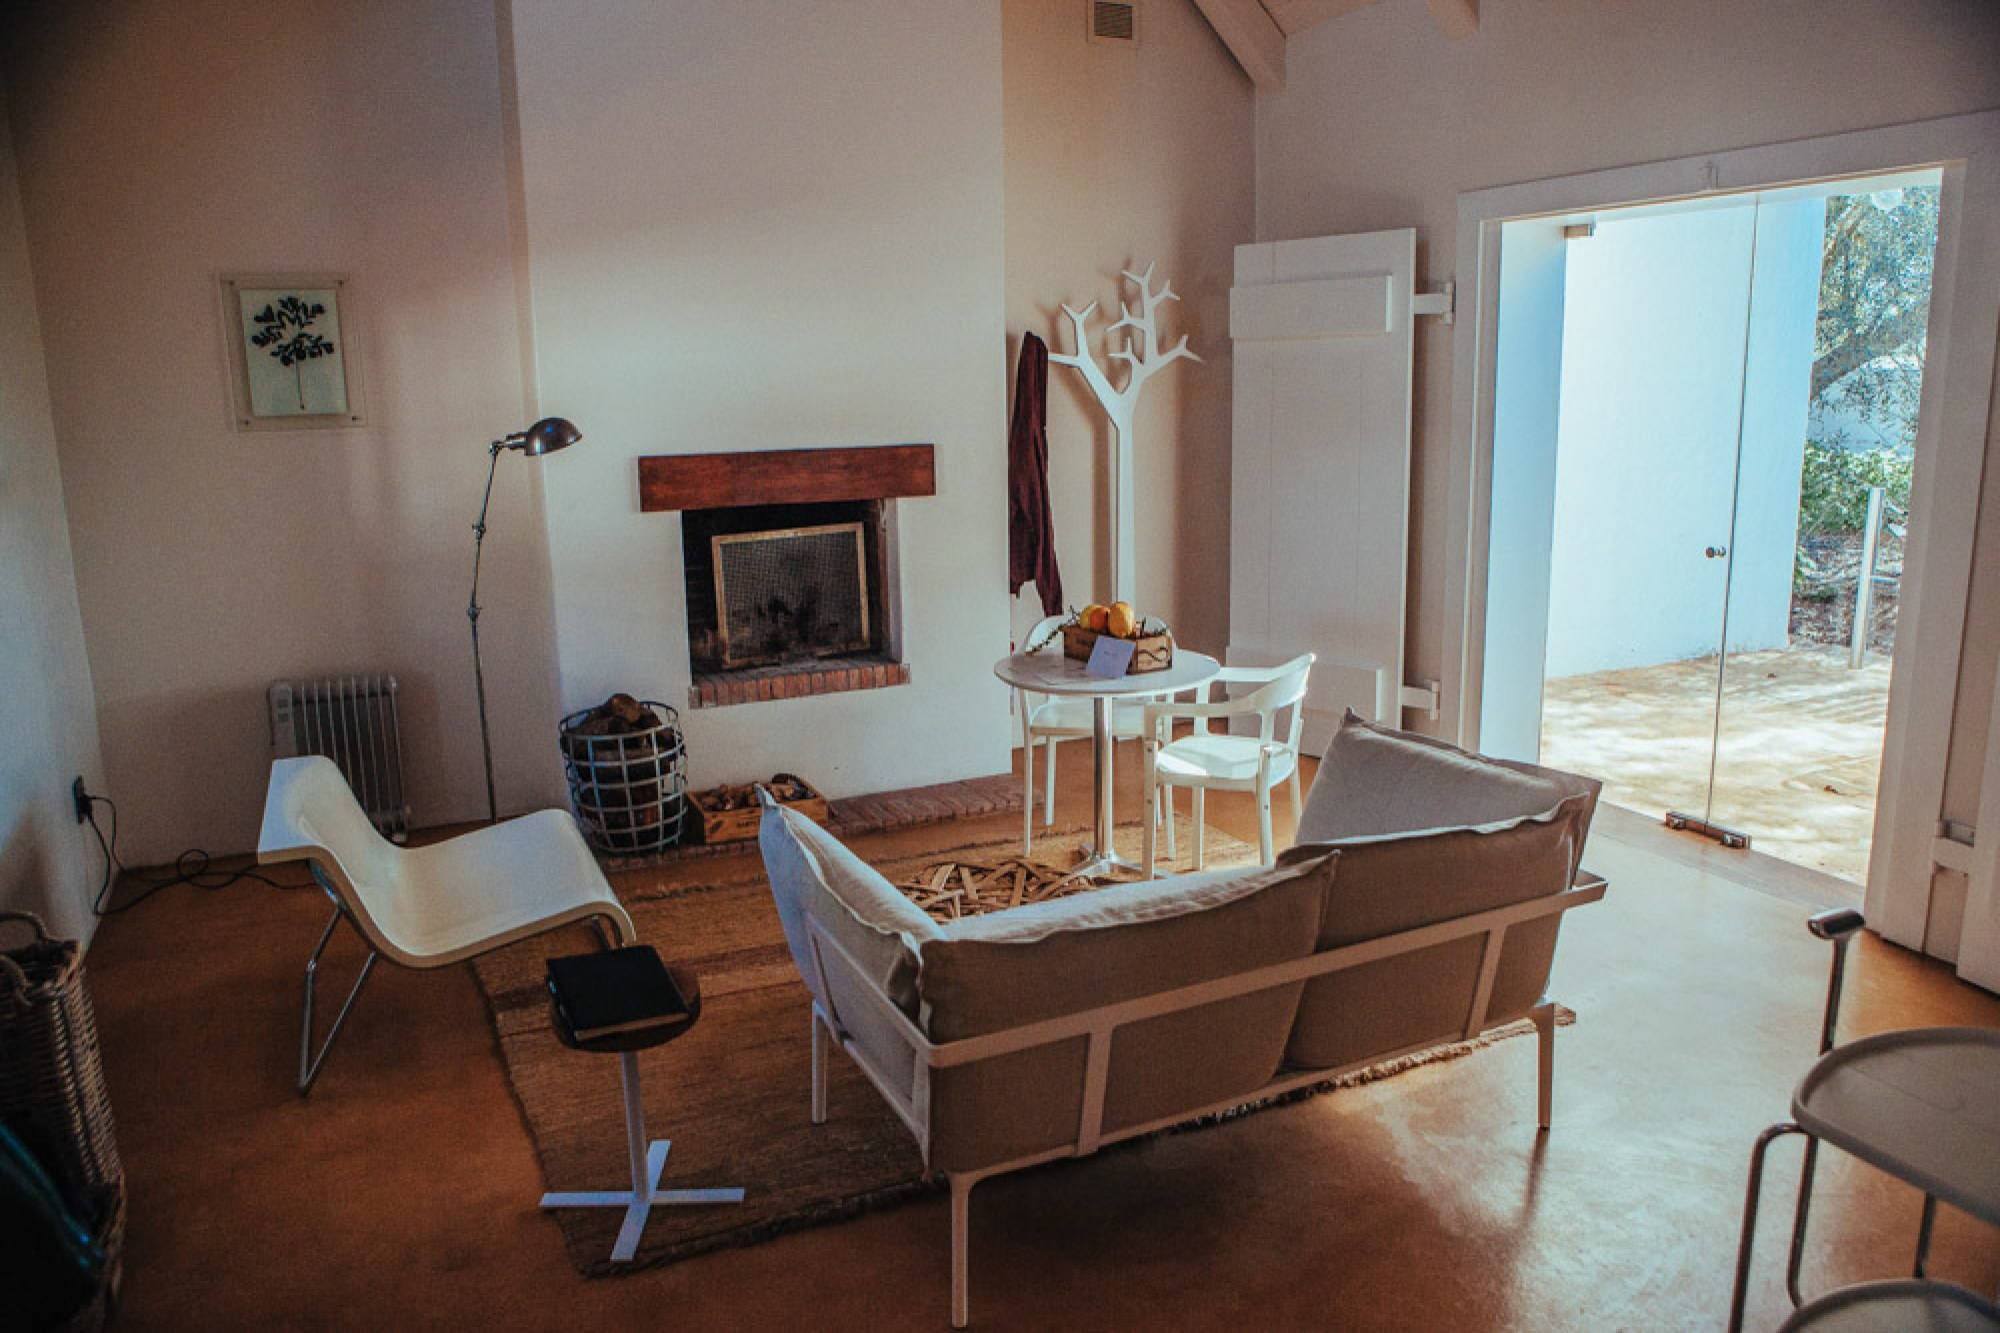 Babylonstoren hotel review, South Africa